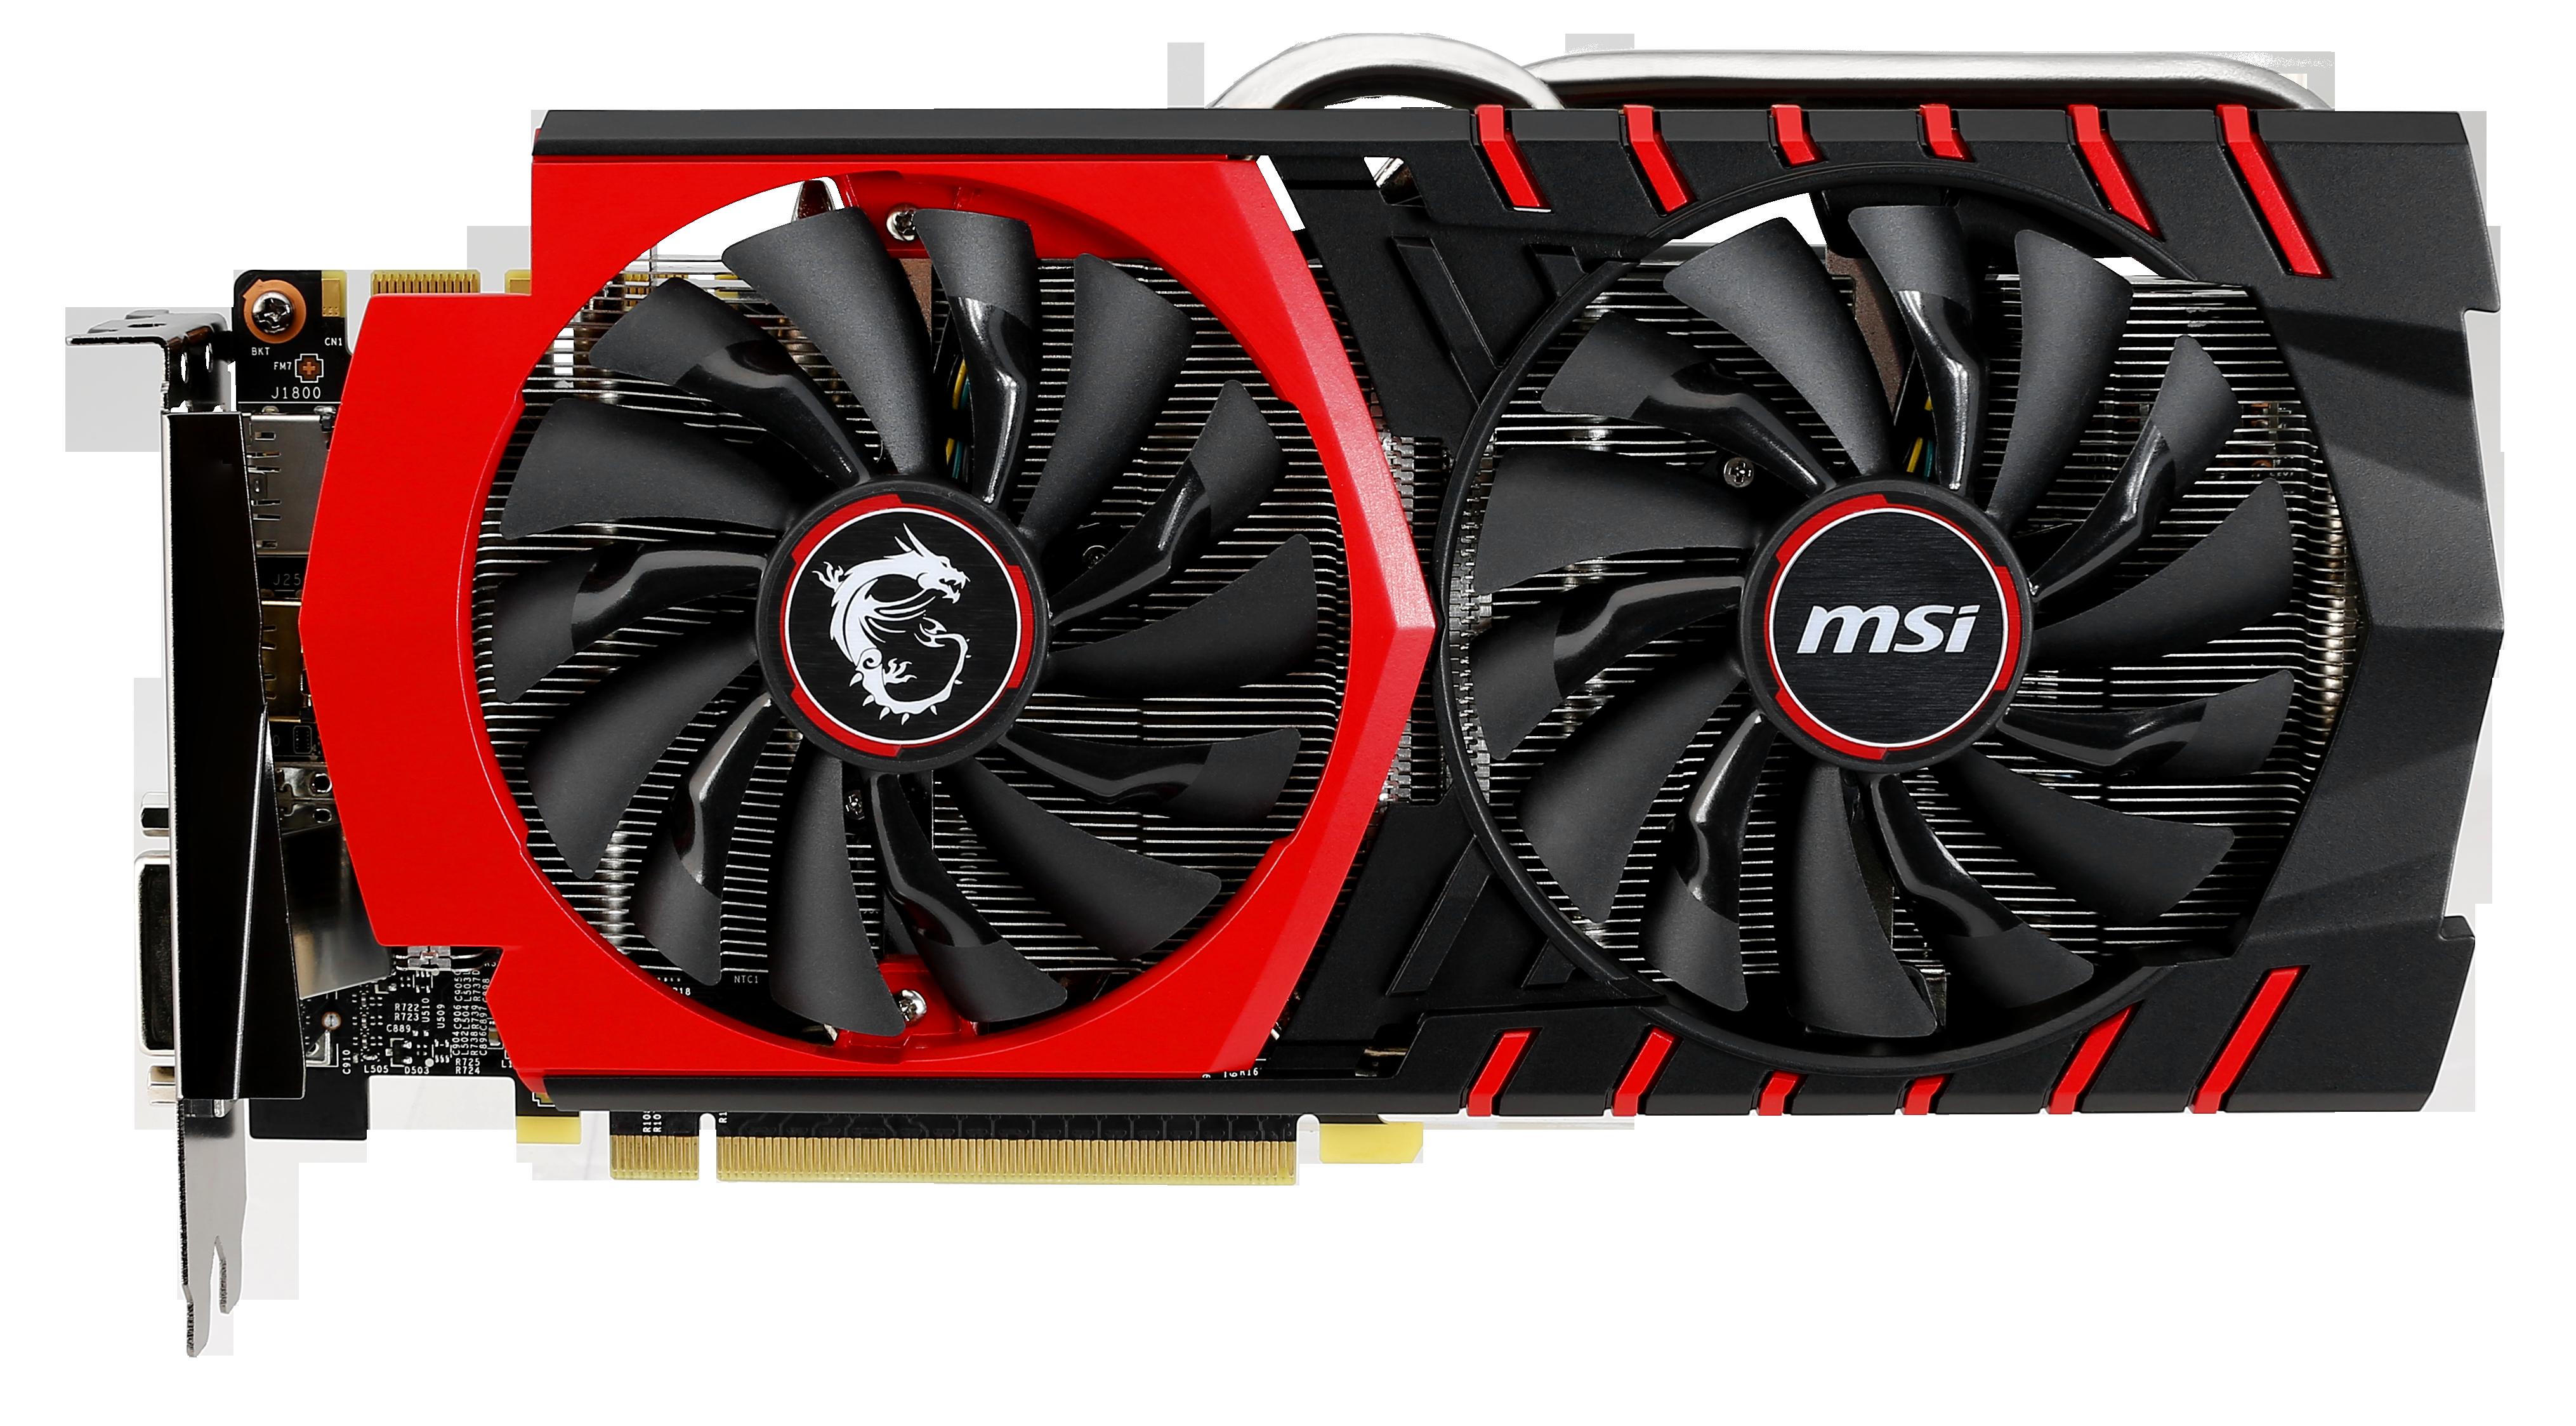 MSI GeForce GTX 970 GAMING 4 GB Twin Frozr V